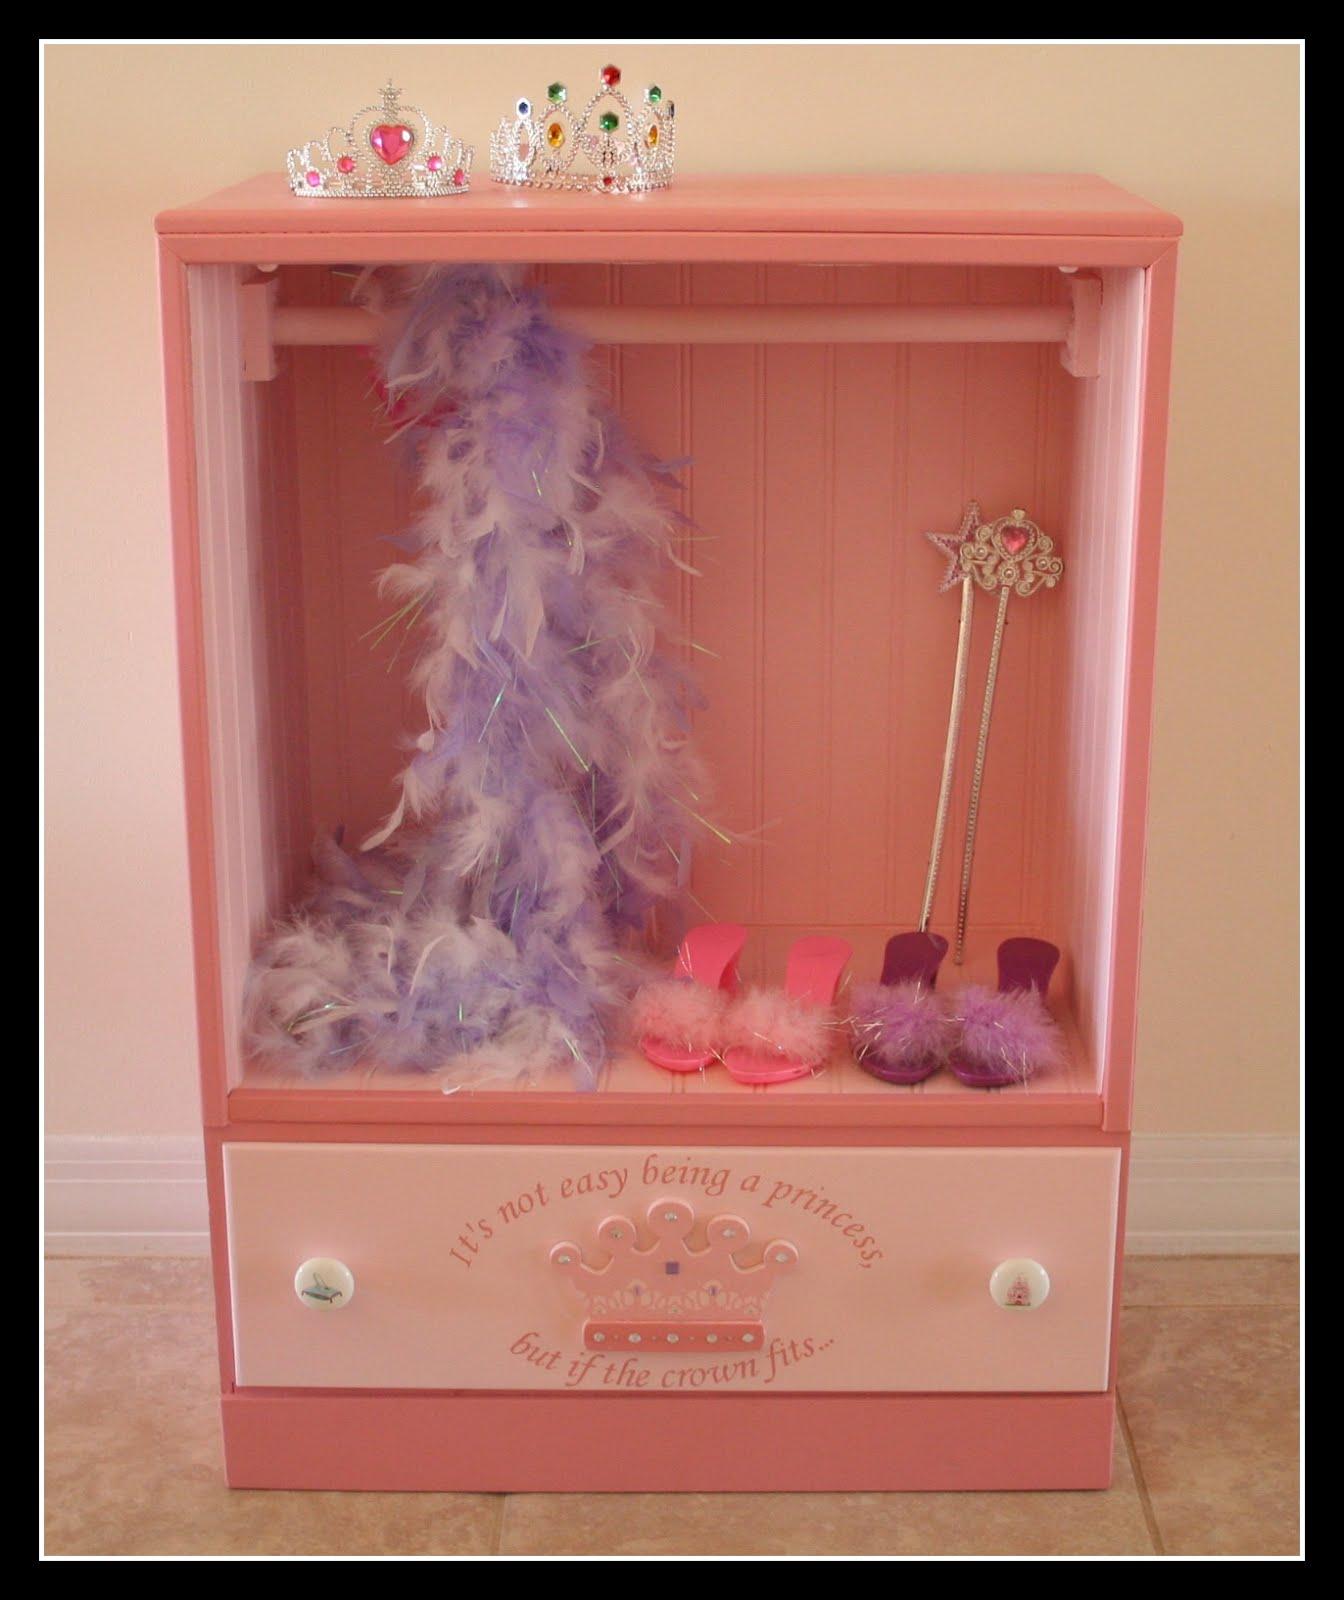 fresh cut flours not quite fit for a queen. Black Bedroom Furniture Sets. Home Design Ideas